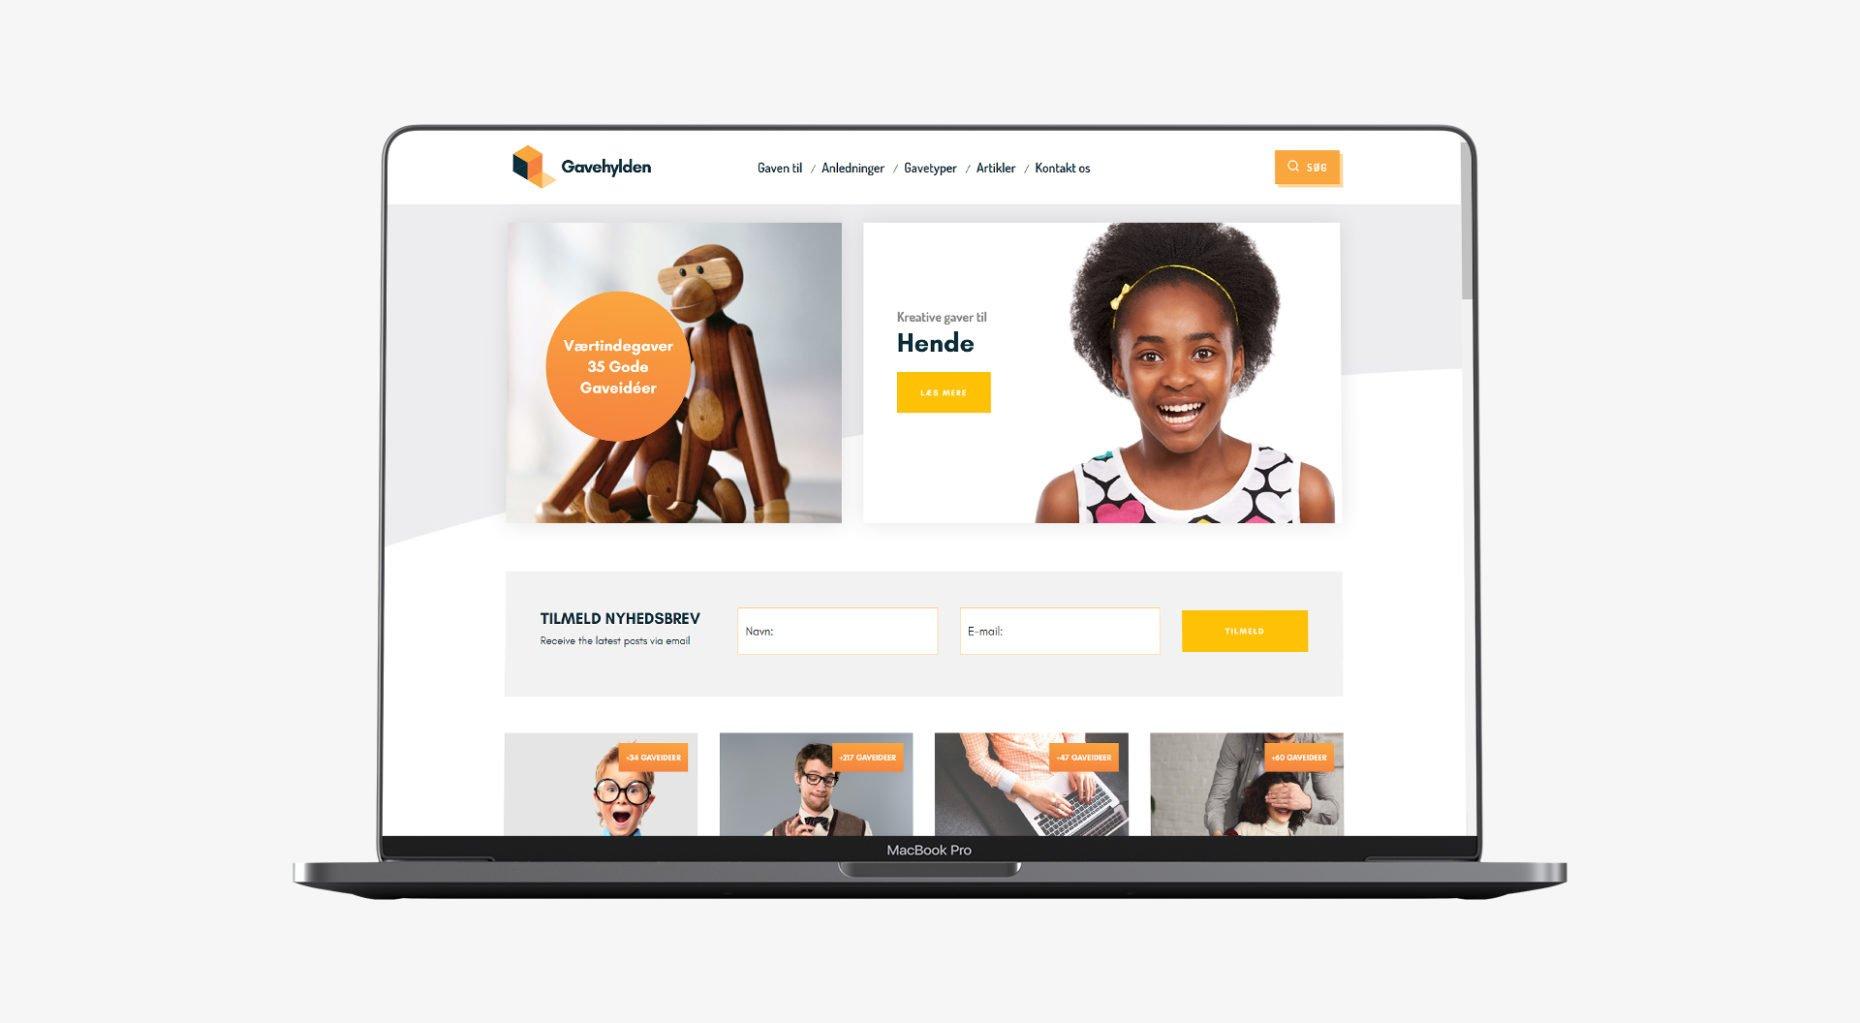 lennartc webdesign - gavehylden.dk